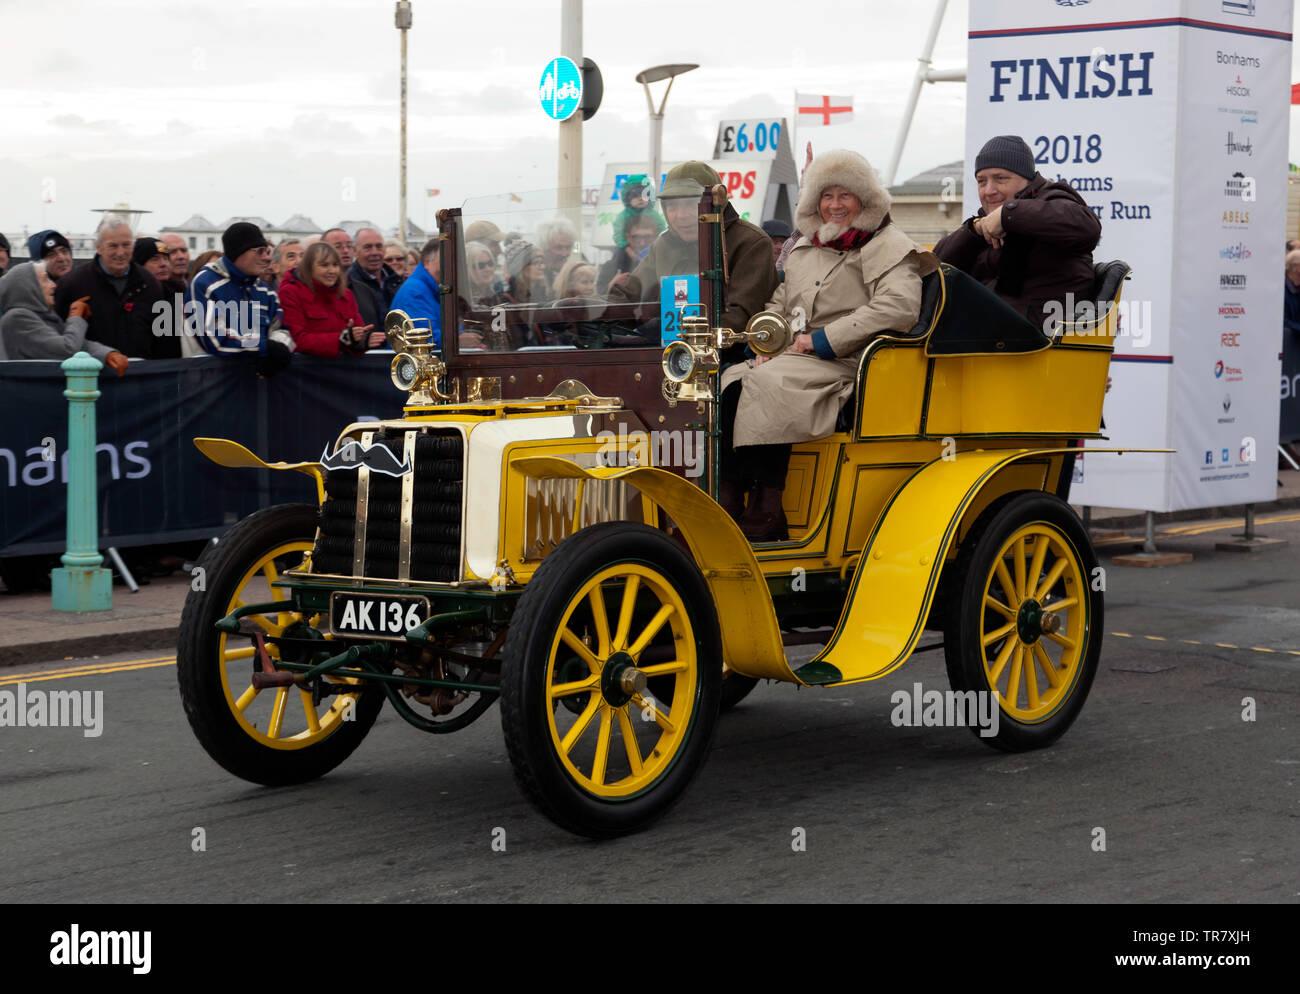 Mr Peter Boulding driving his 1903 Darracq, across the finishing line of the 2018 London to Brighton Veteran Car Run - Stock Image